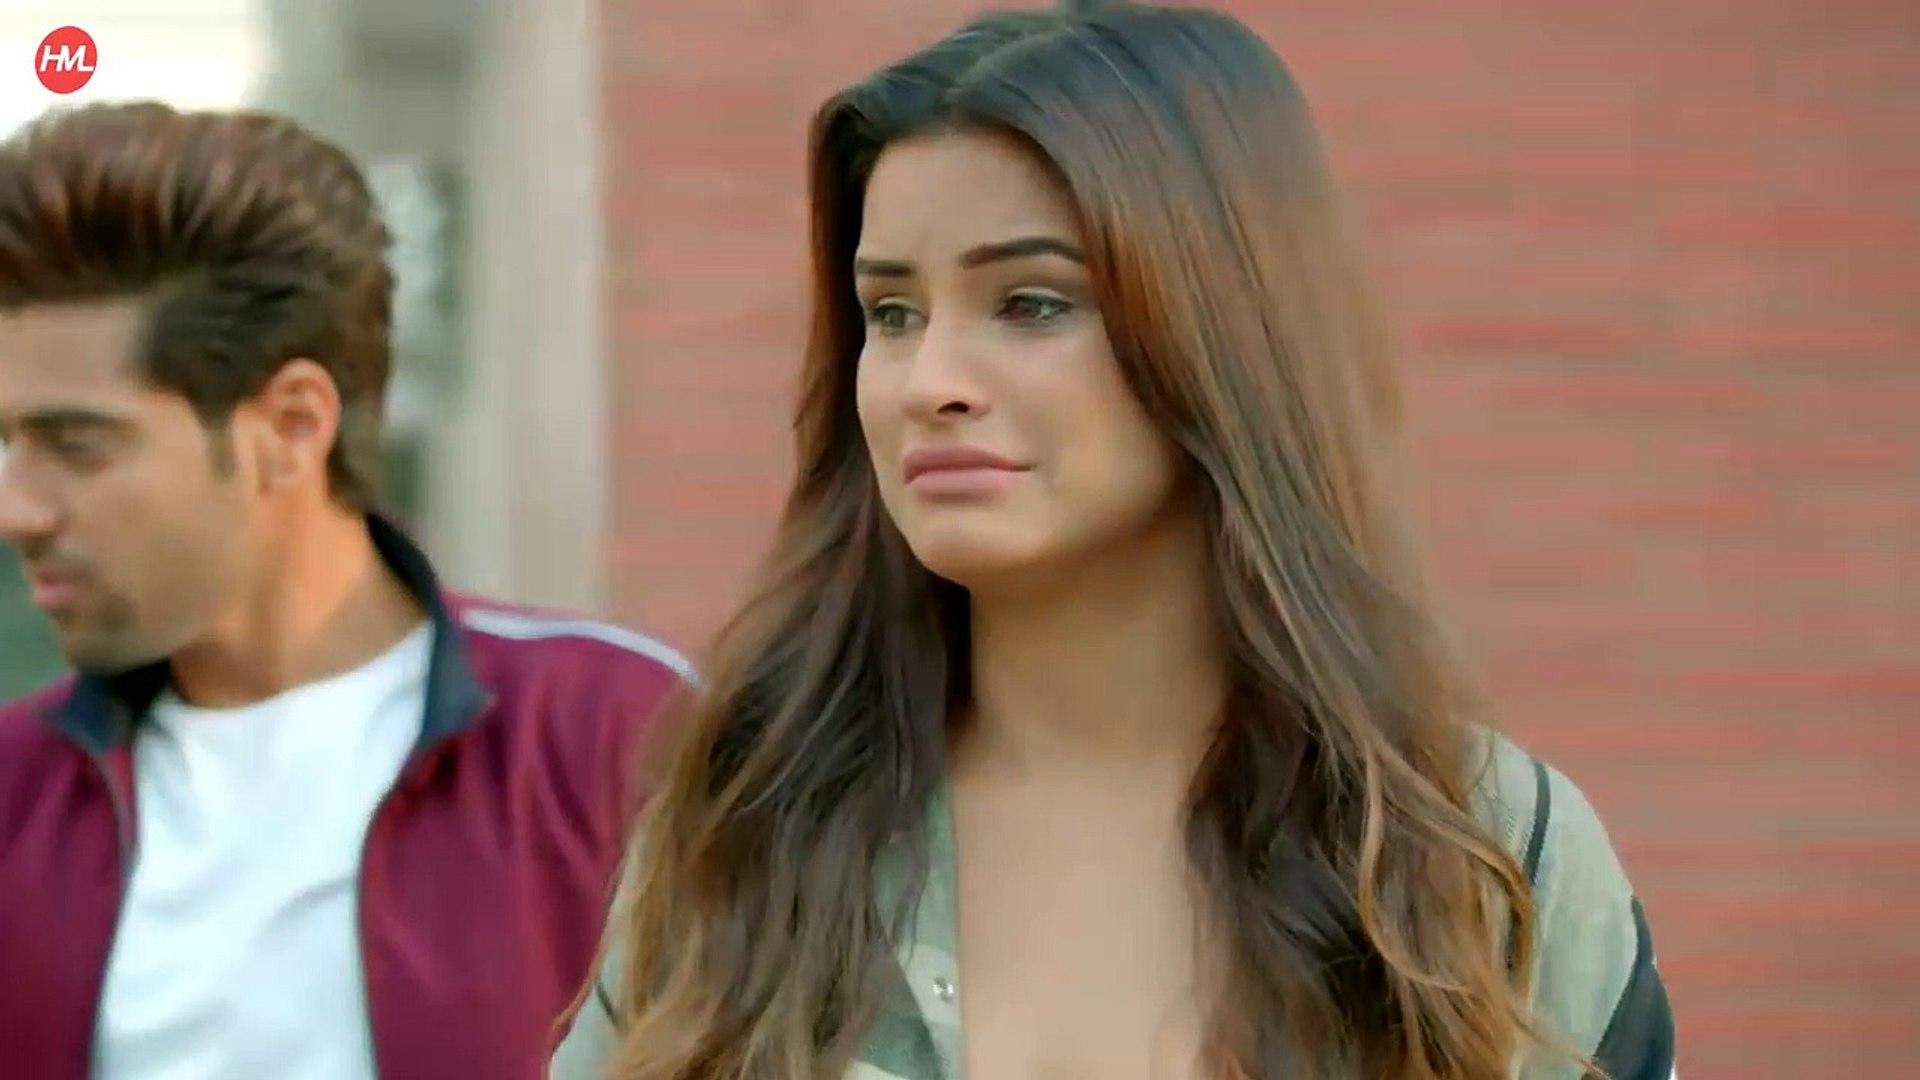 Bewafa Bewafa (Video Song) New Sad Love Story Sad Love New Version Hindi  Songs 2018 - video dailymotion